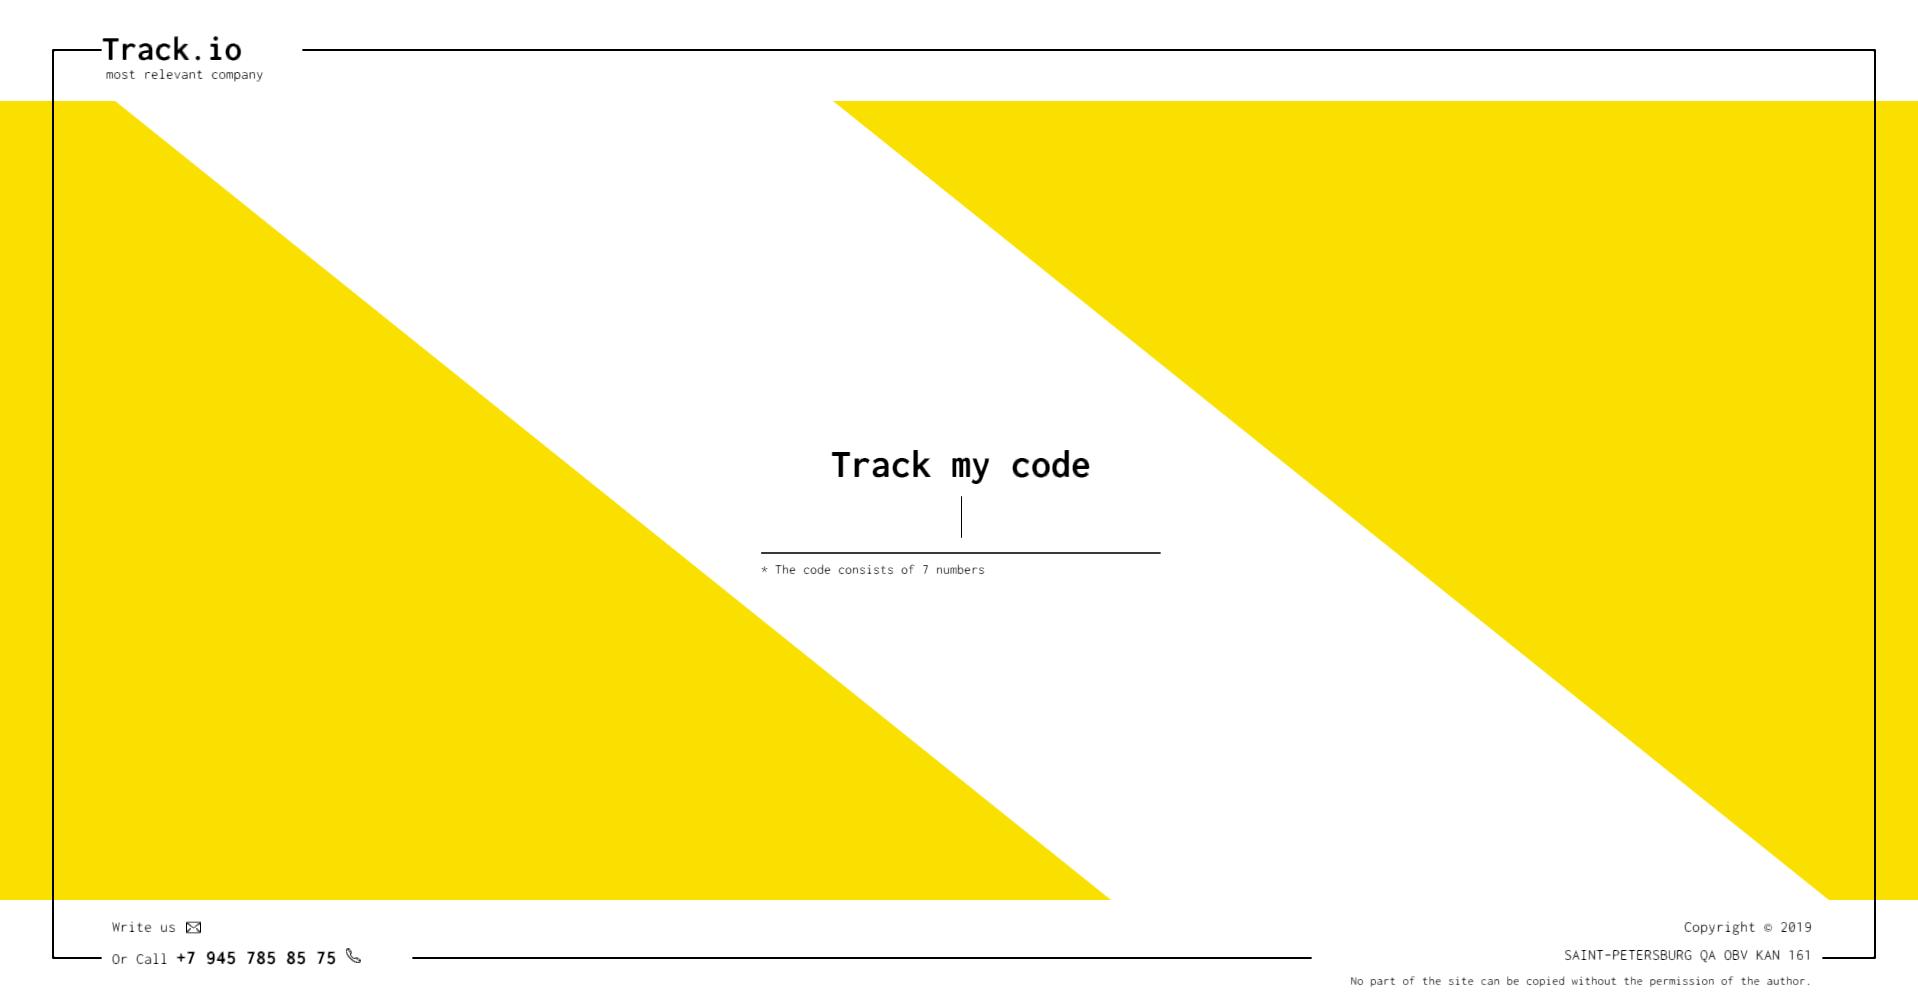 track.io